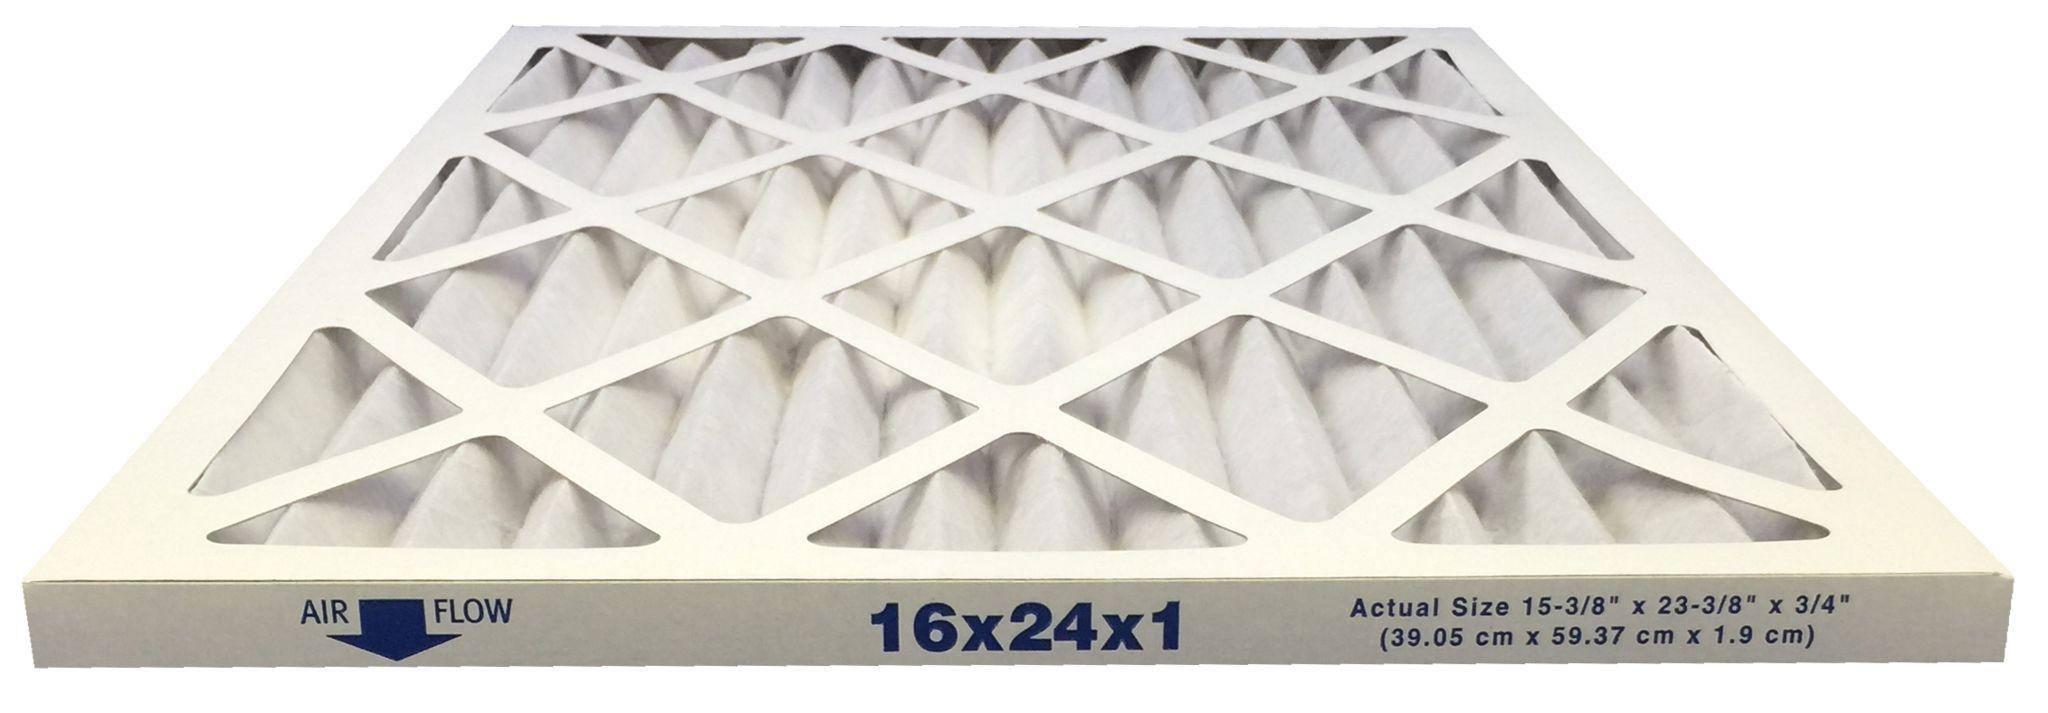 16x24x1 Merv 13 Allergy Elite Pleated Air Filter Case of